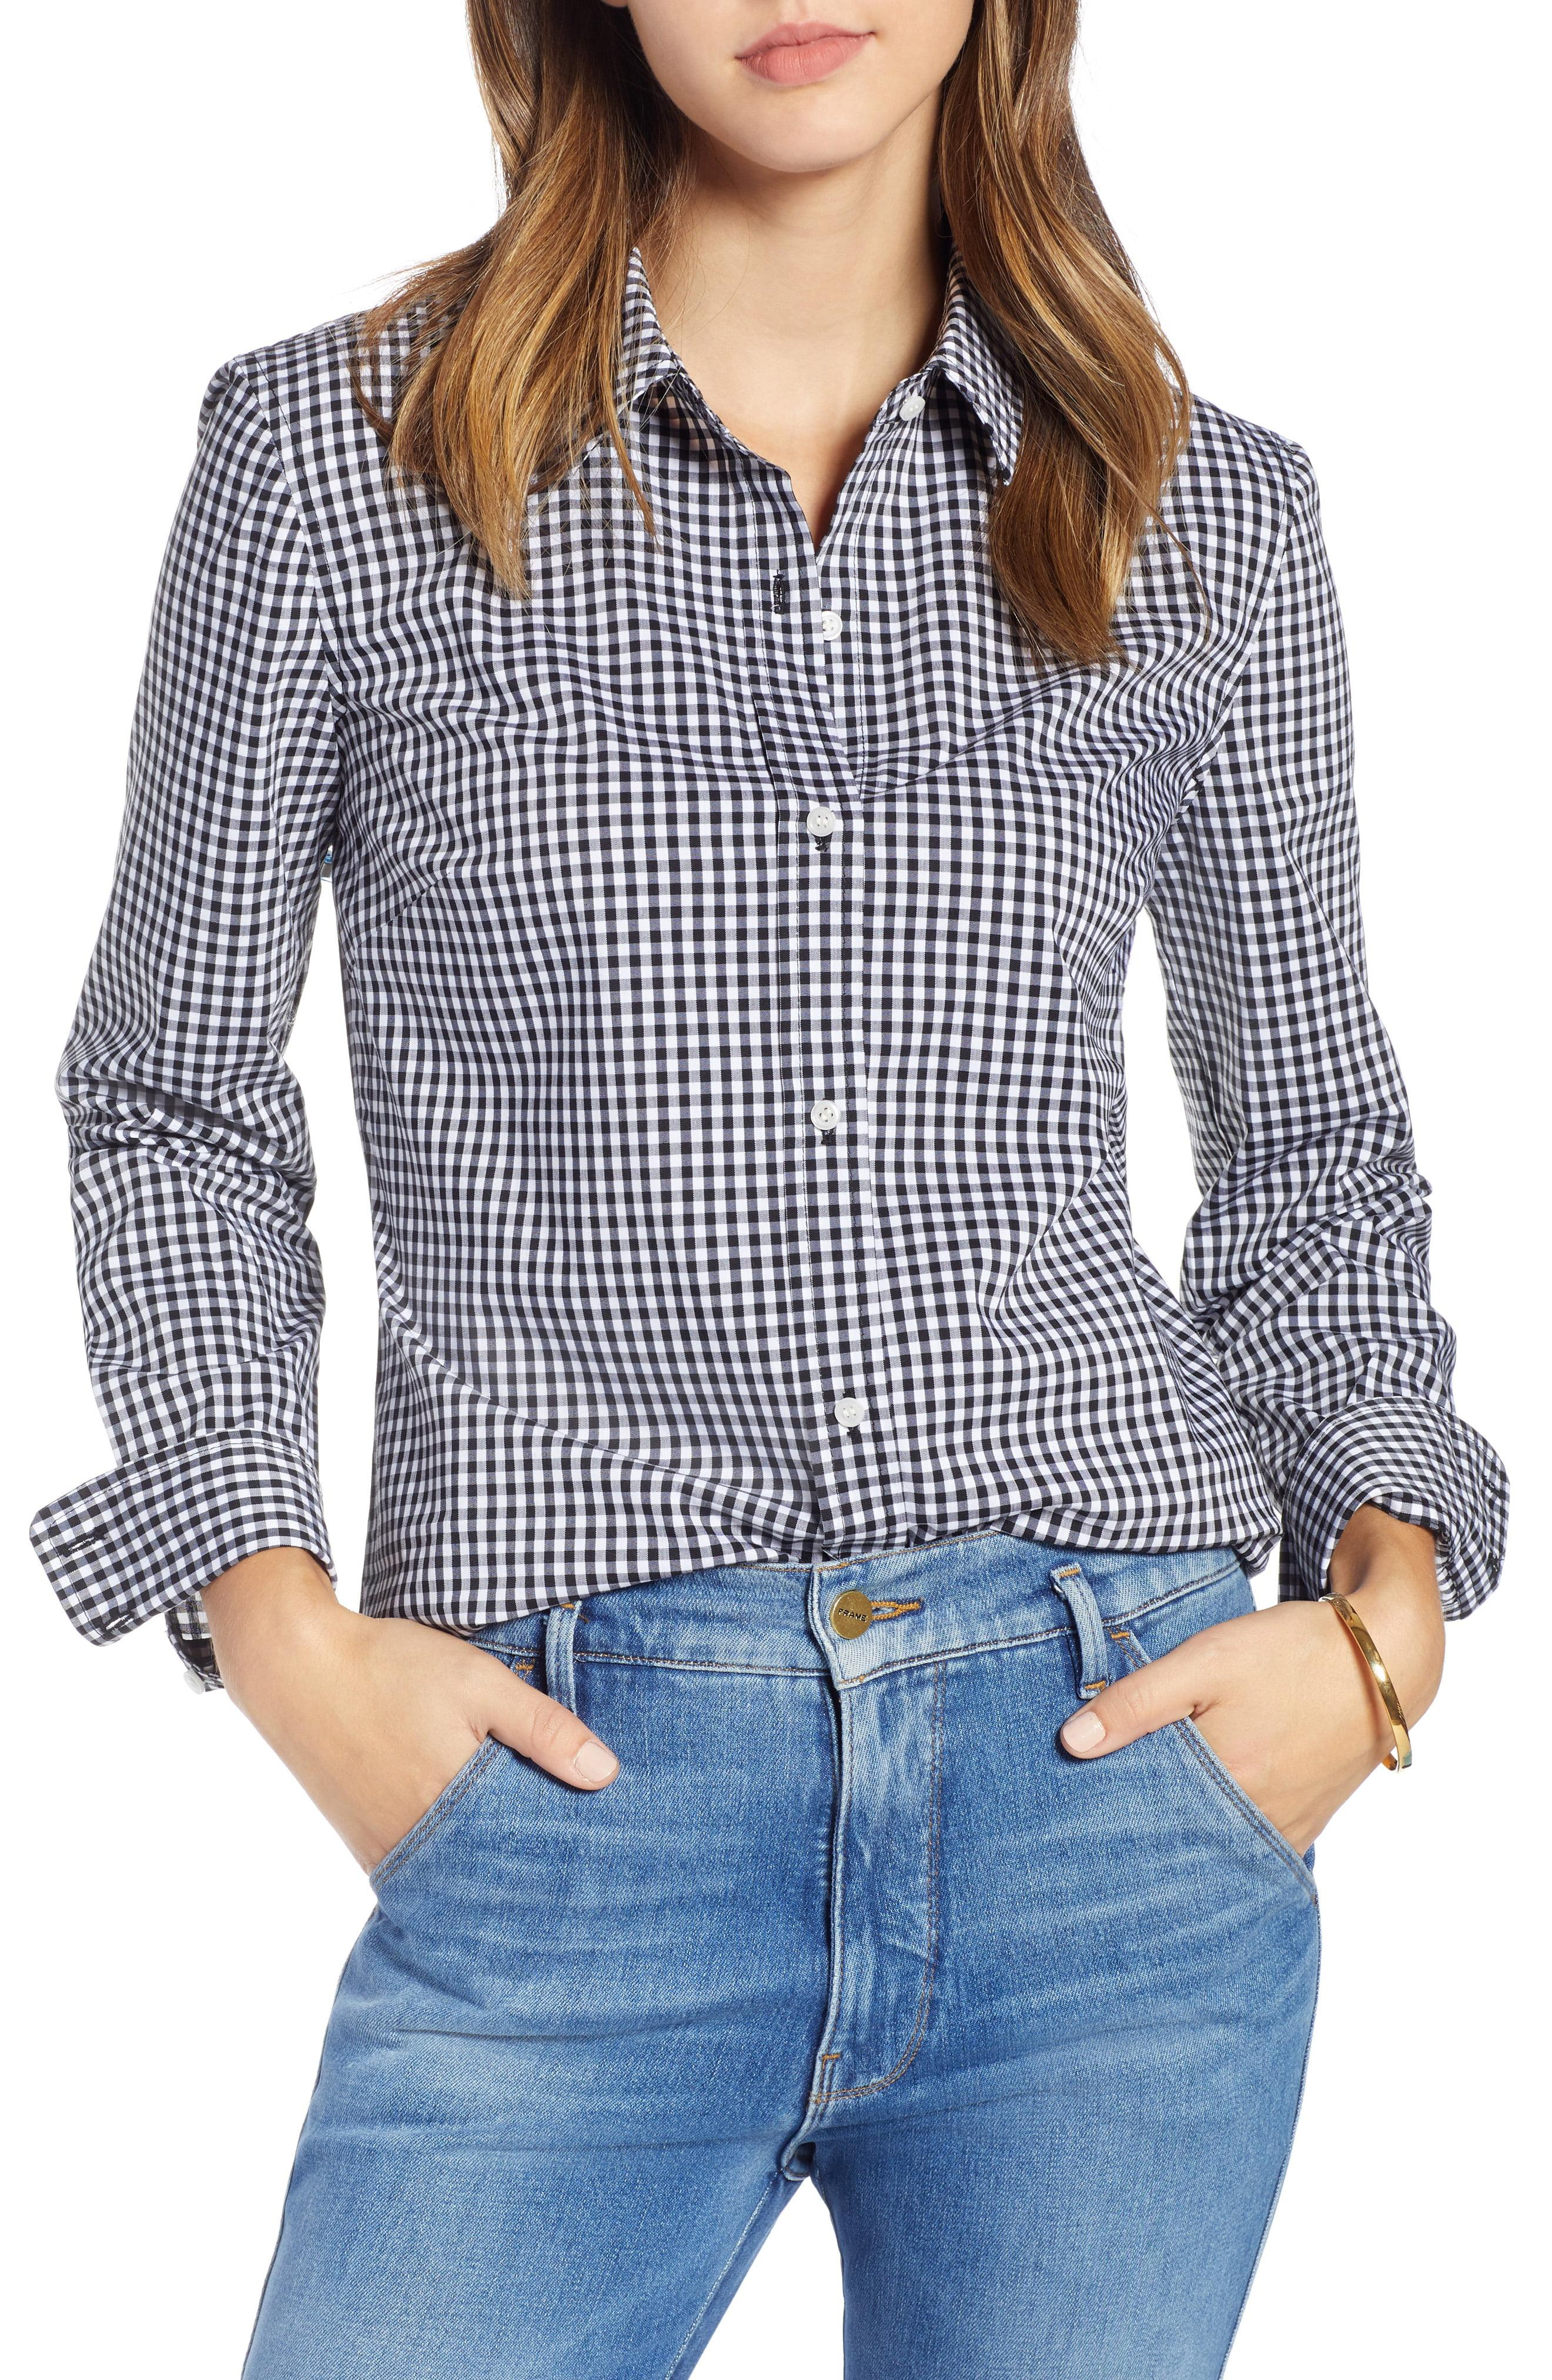 c16861d81d Lyst - Nordstrom 1901 Stretch Cotton Blend Shirt in Blue - Save 61%